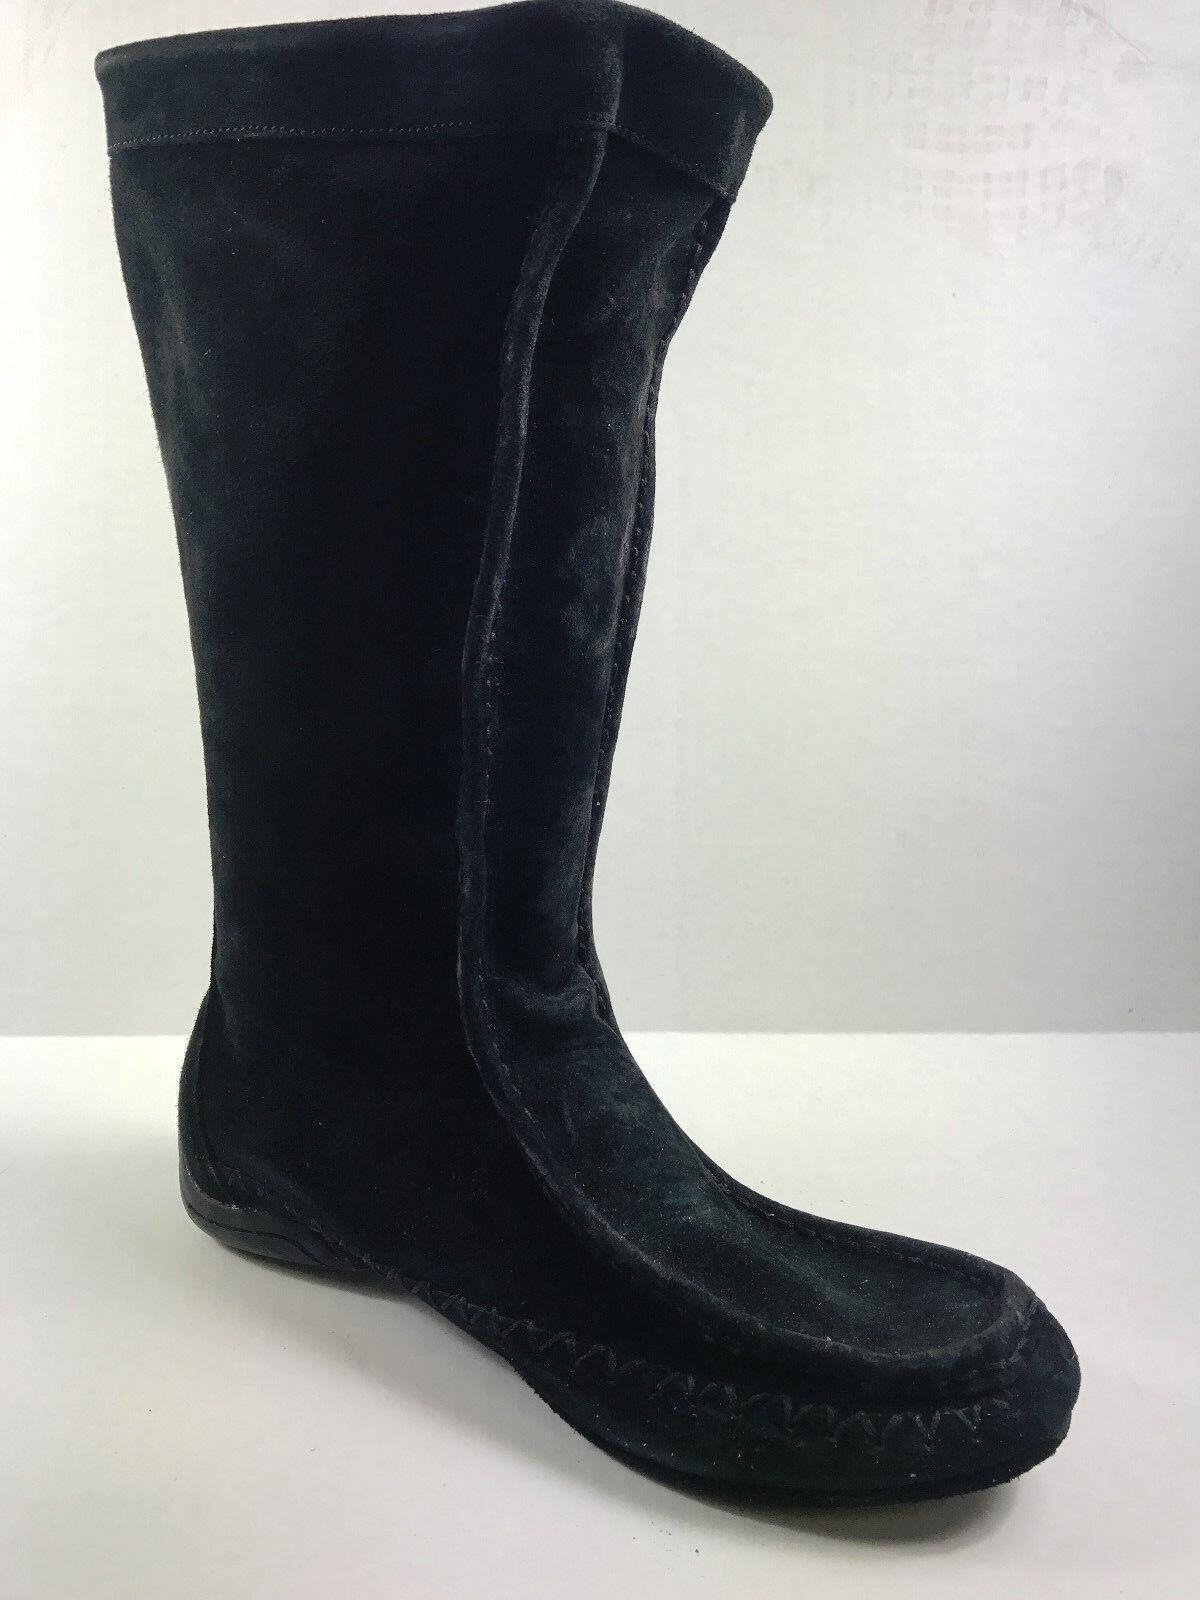 ***NEW*** Gola Kernal Knee-High Suede  Boots Women`s  Color Black